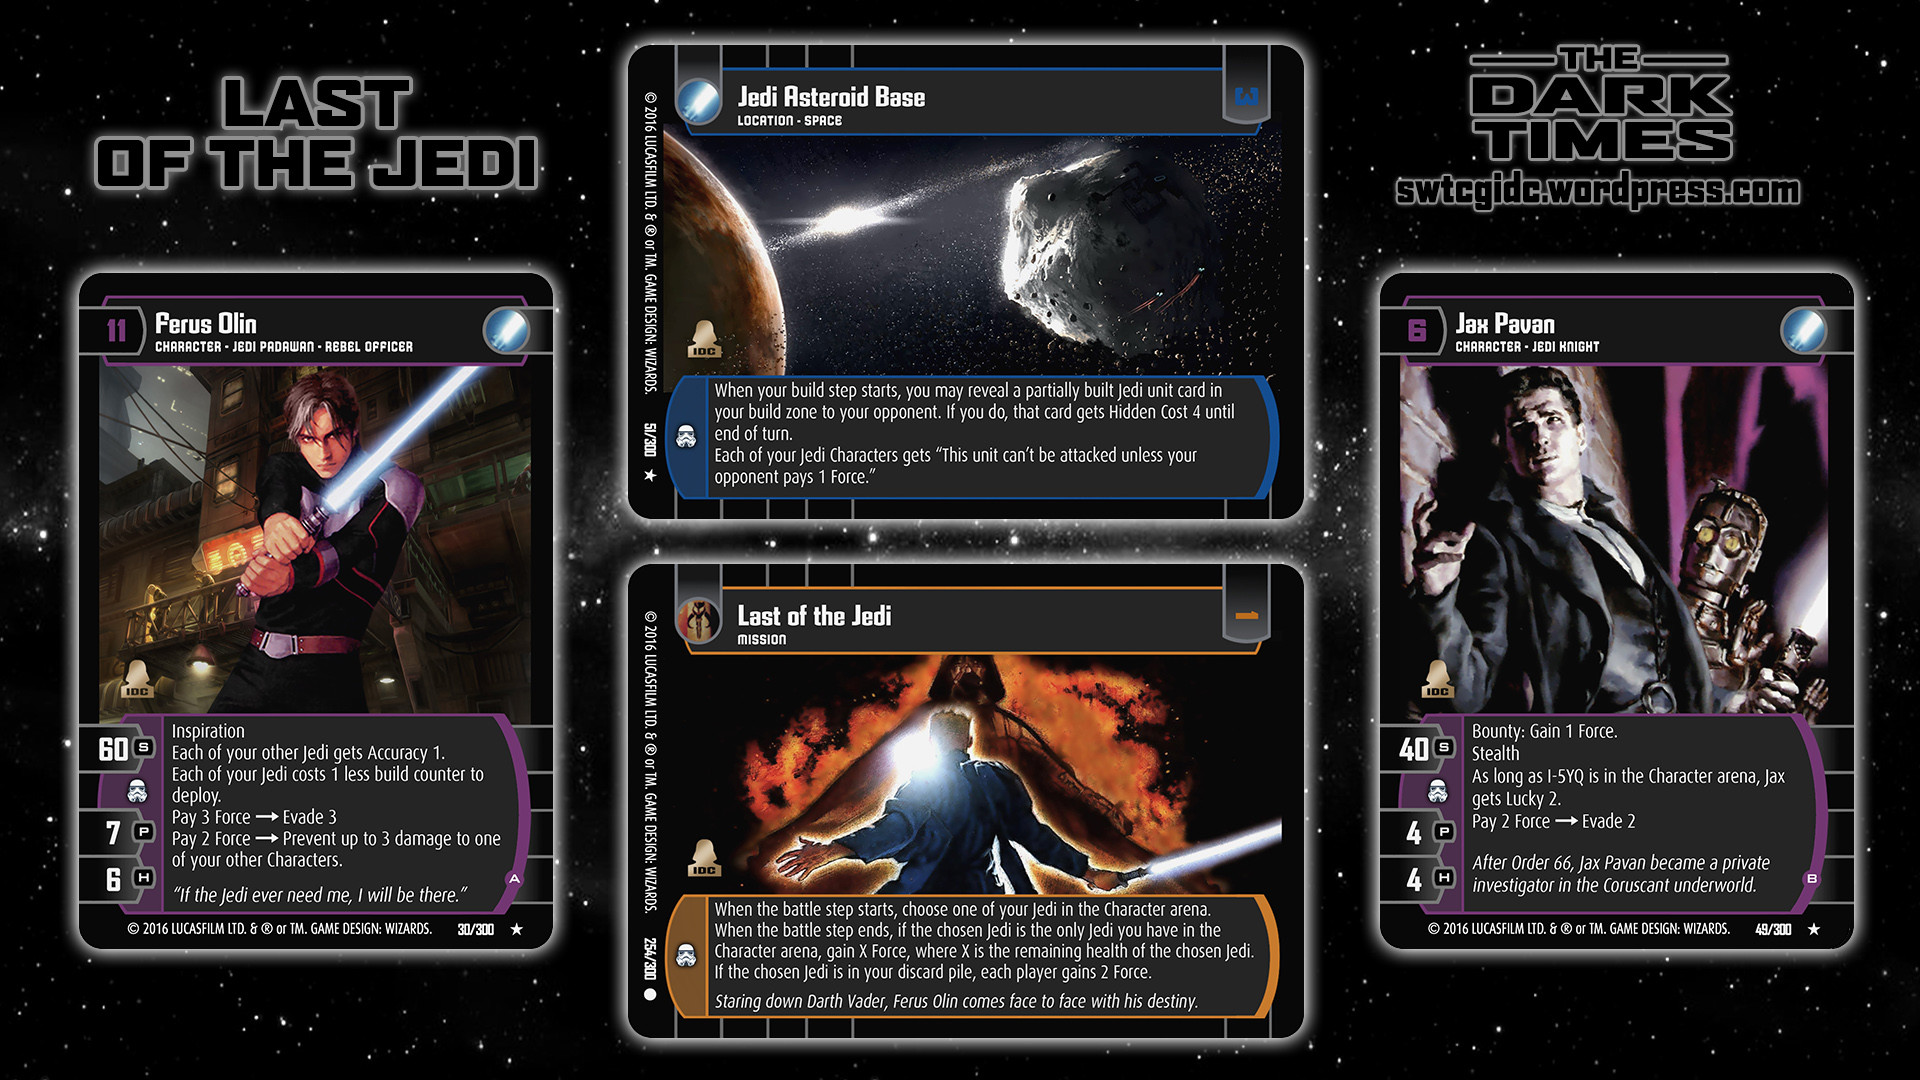 TDT Wallpaper 1 – Last of the Jedi